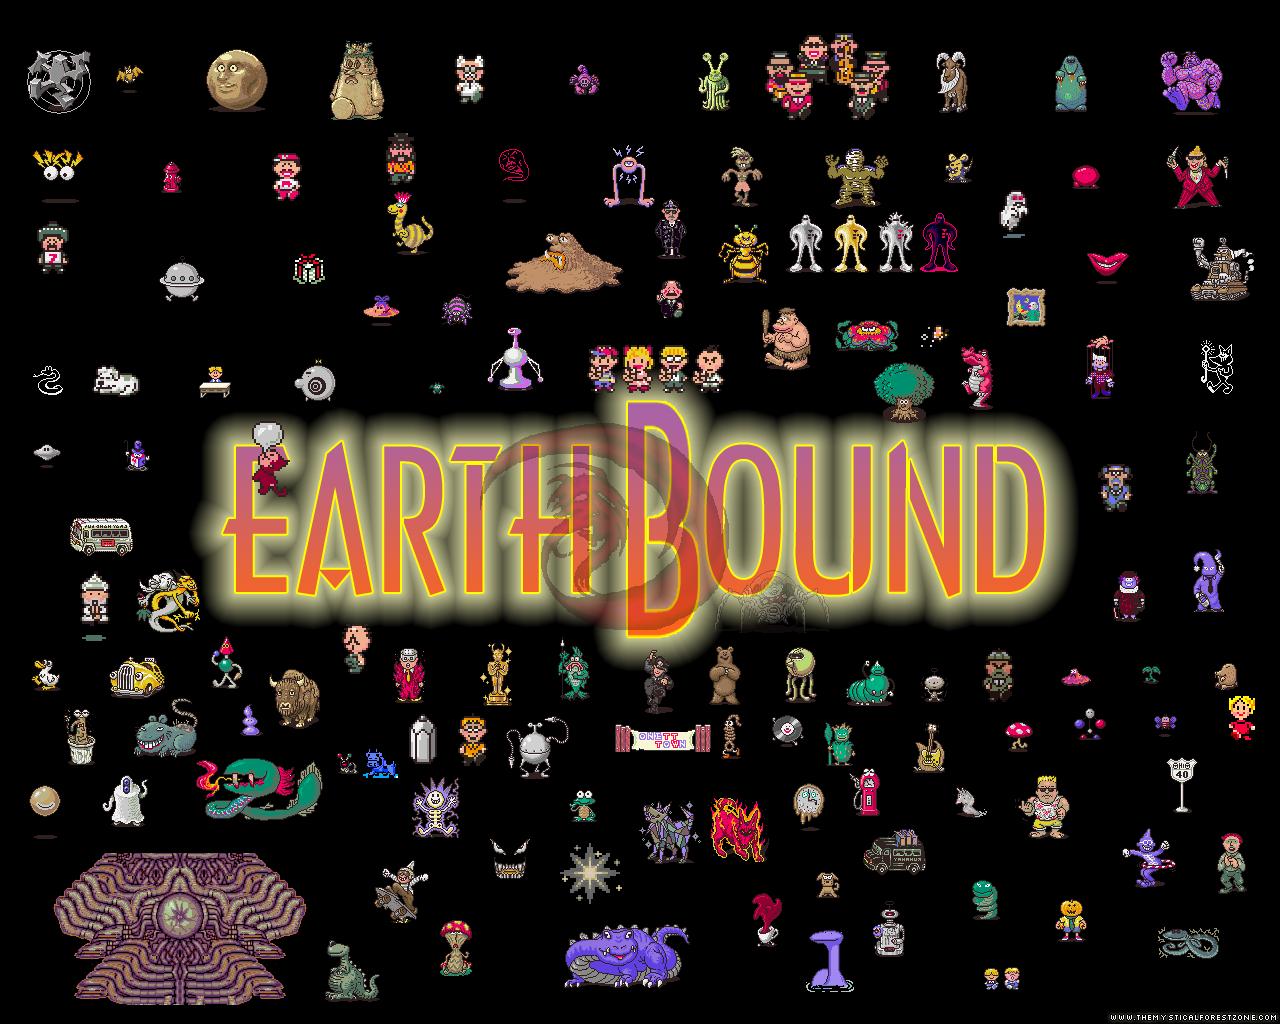 Earthbound Wallpapaer Wallpaper 1280x1024 Earthbound Wallpapaer 1280x1024